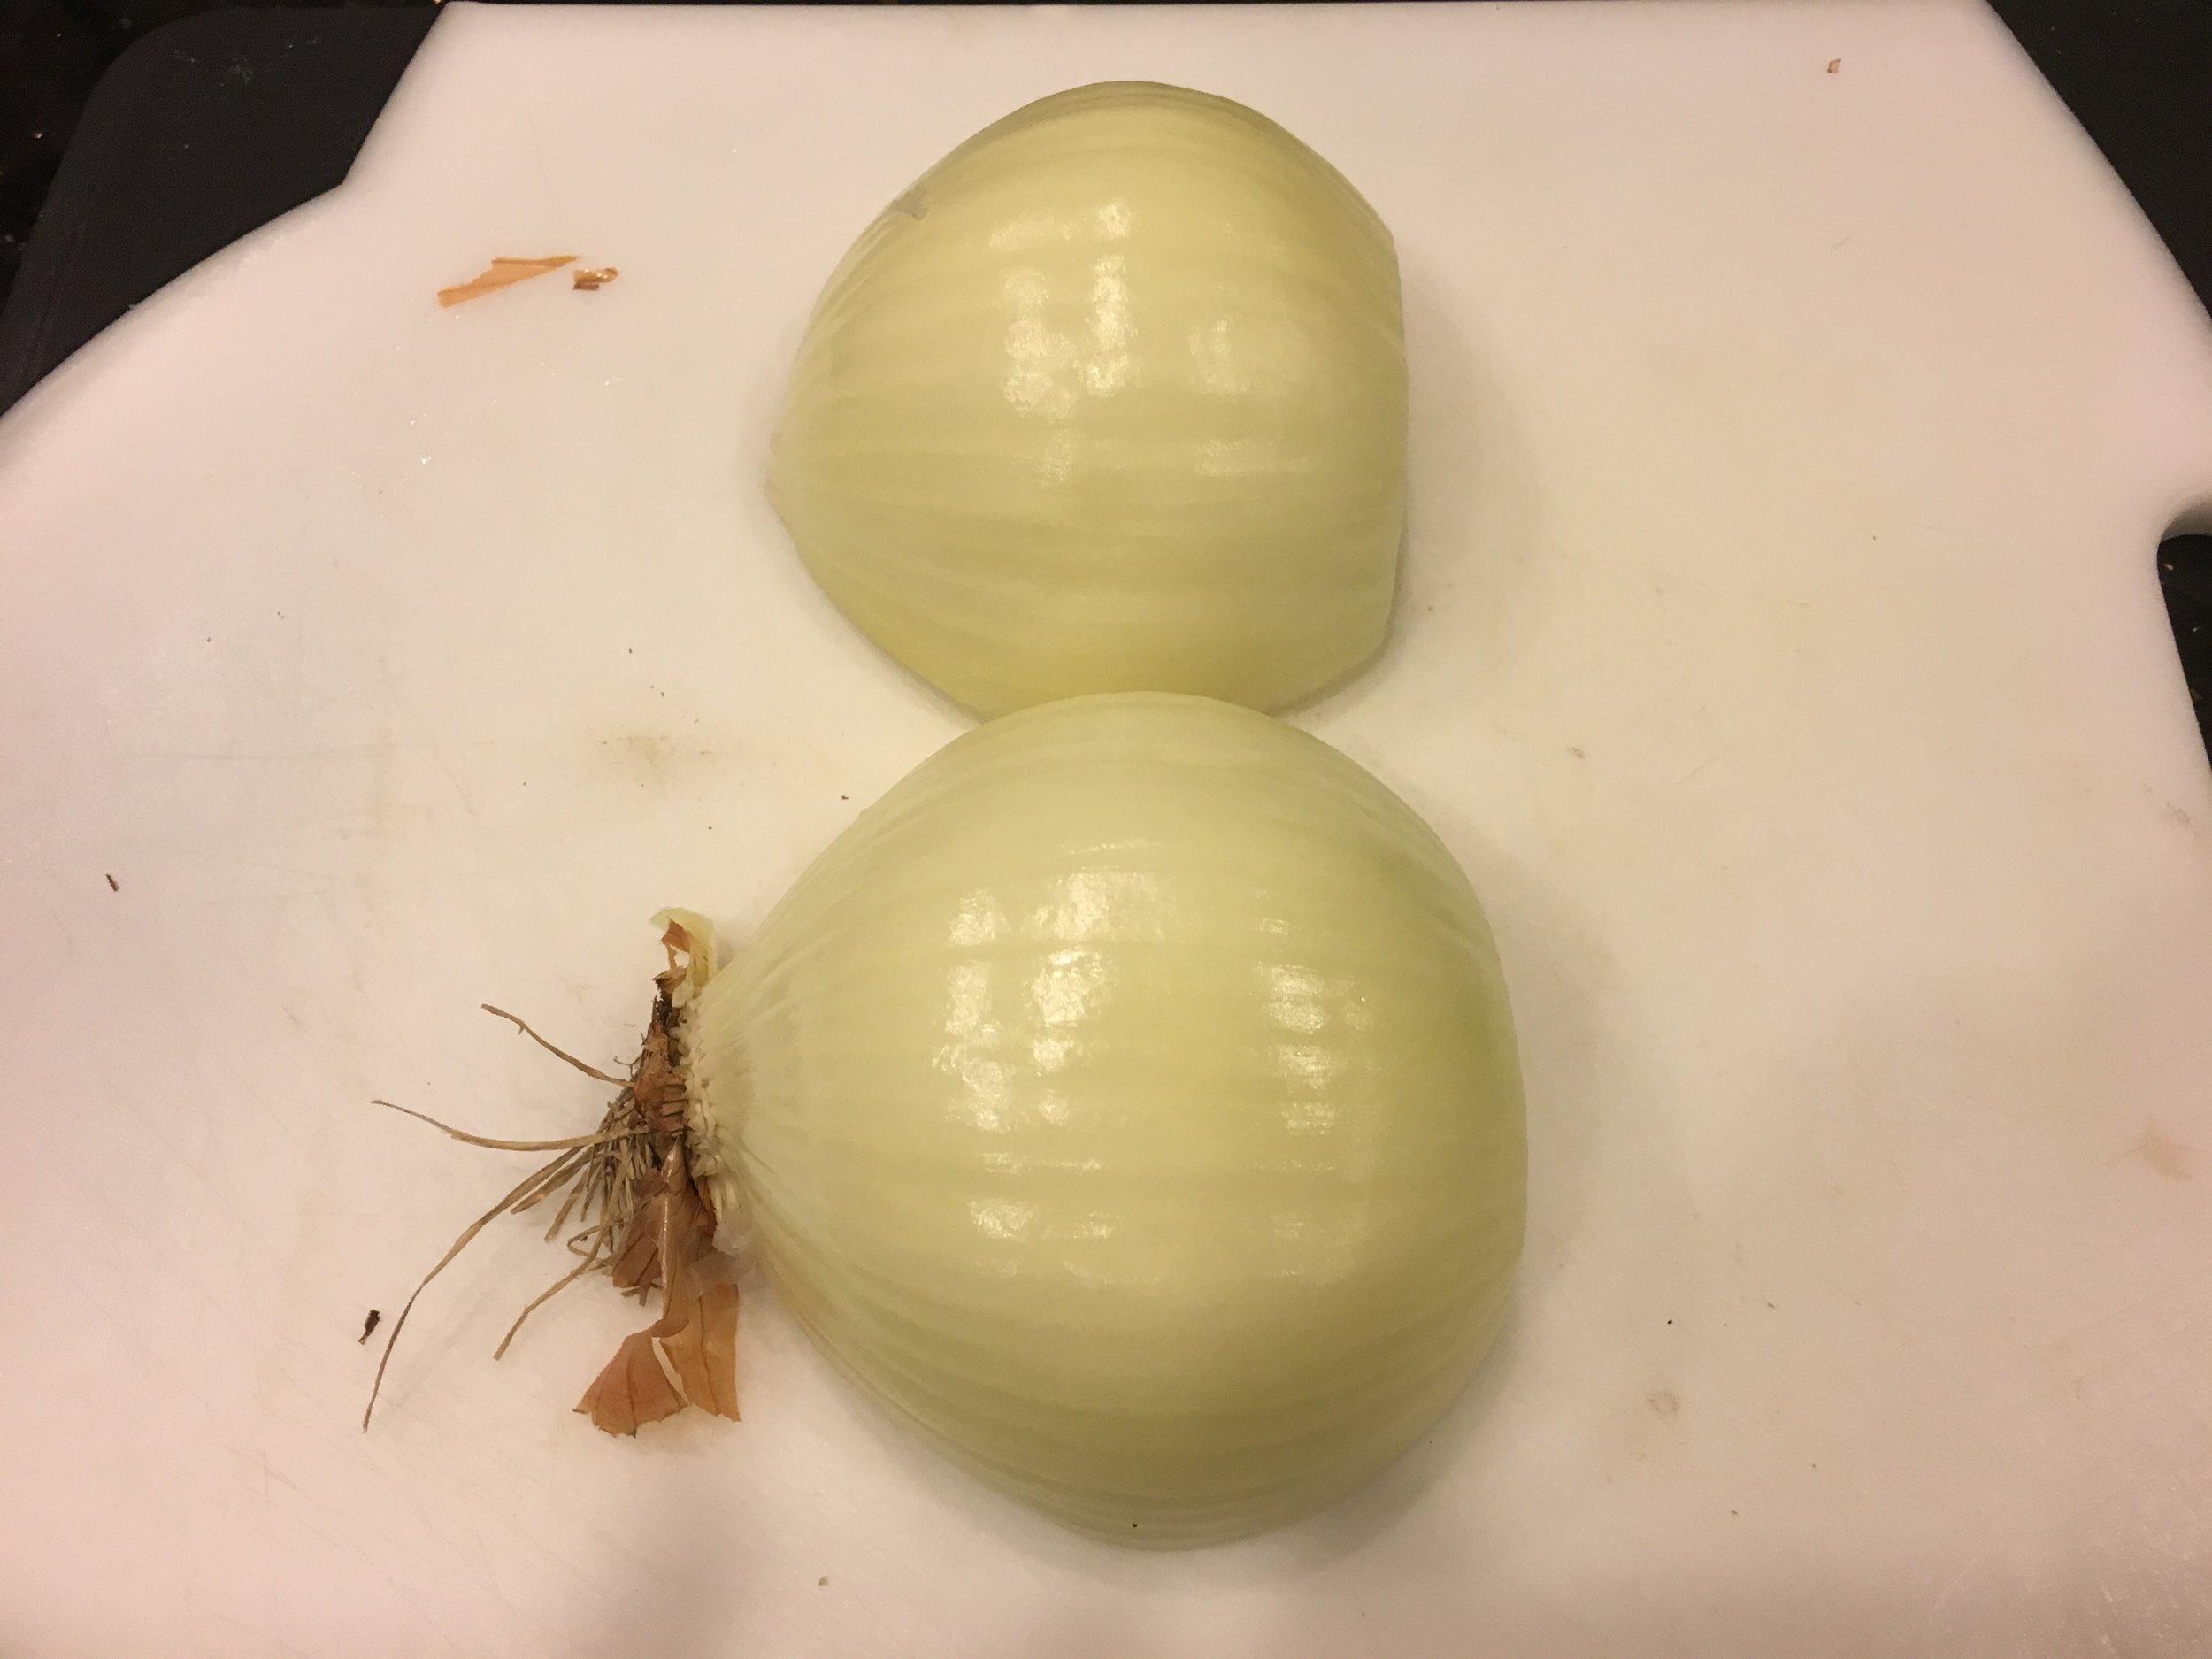 Onion prep